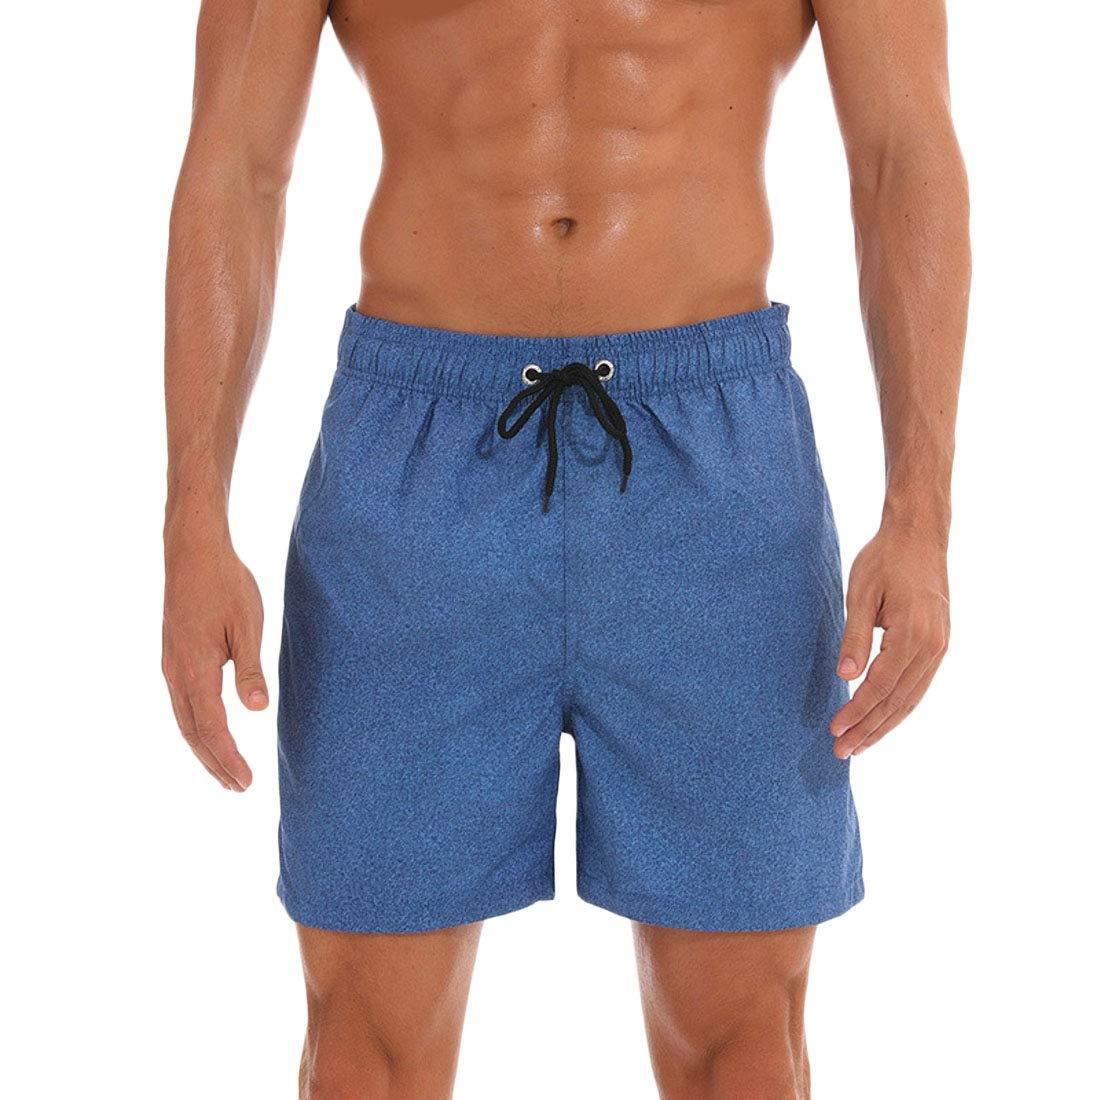 YYear Men Flamingo Active Summer Quick Dry Floral Print Elastic Waist Beach Shorts Boardshort Swim Trunk